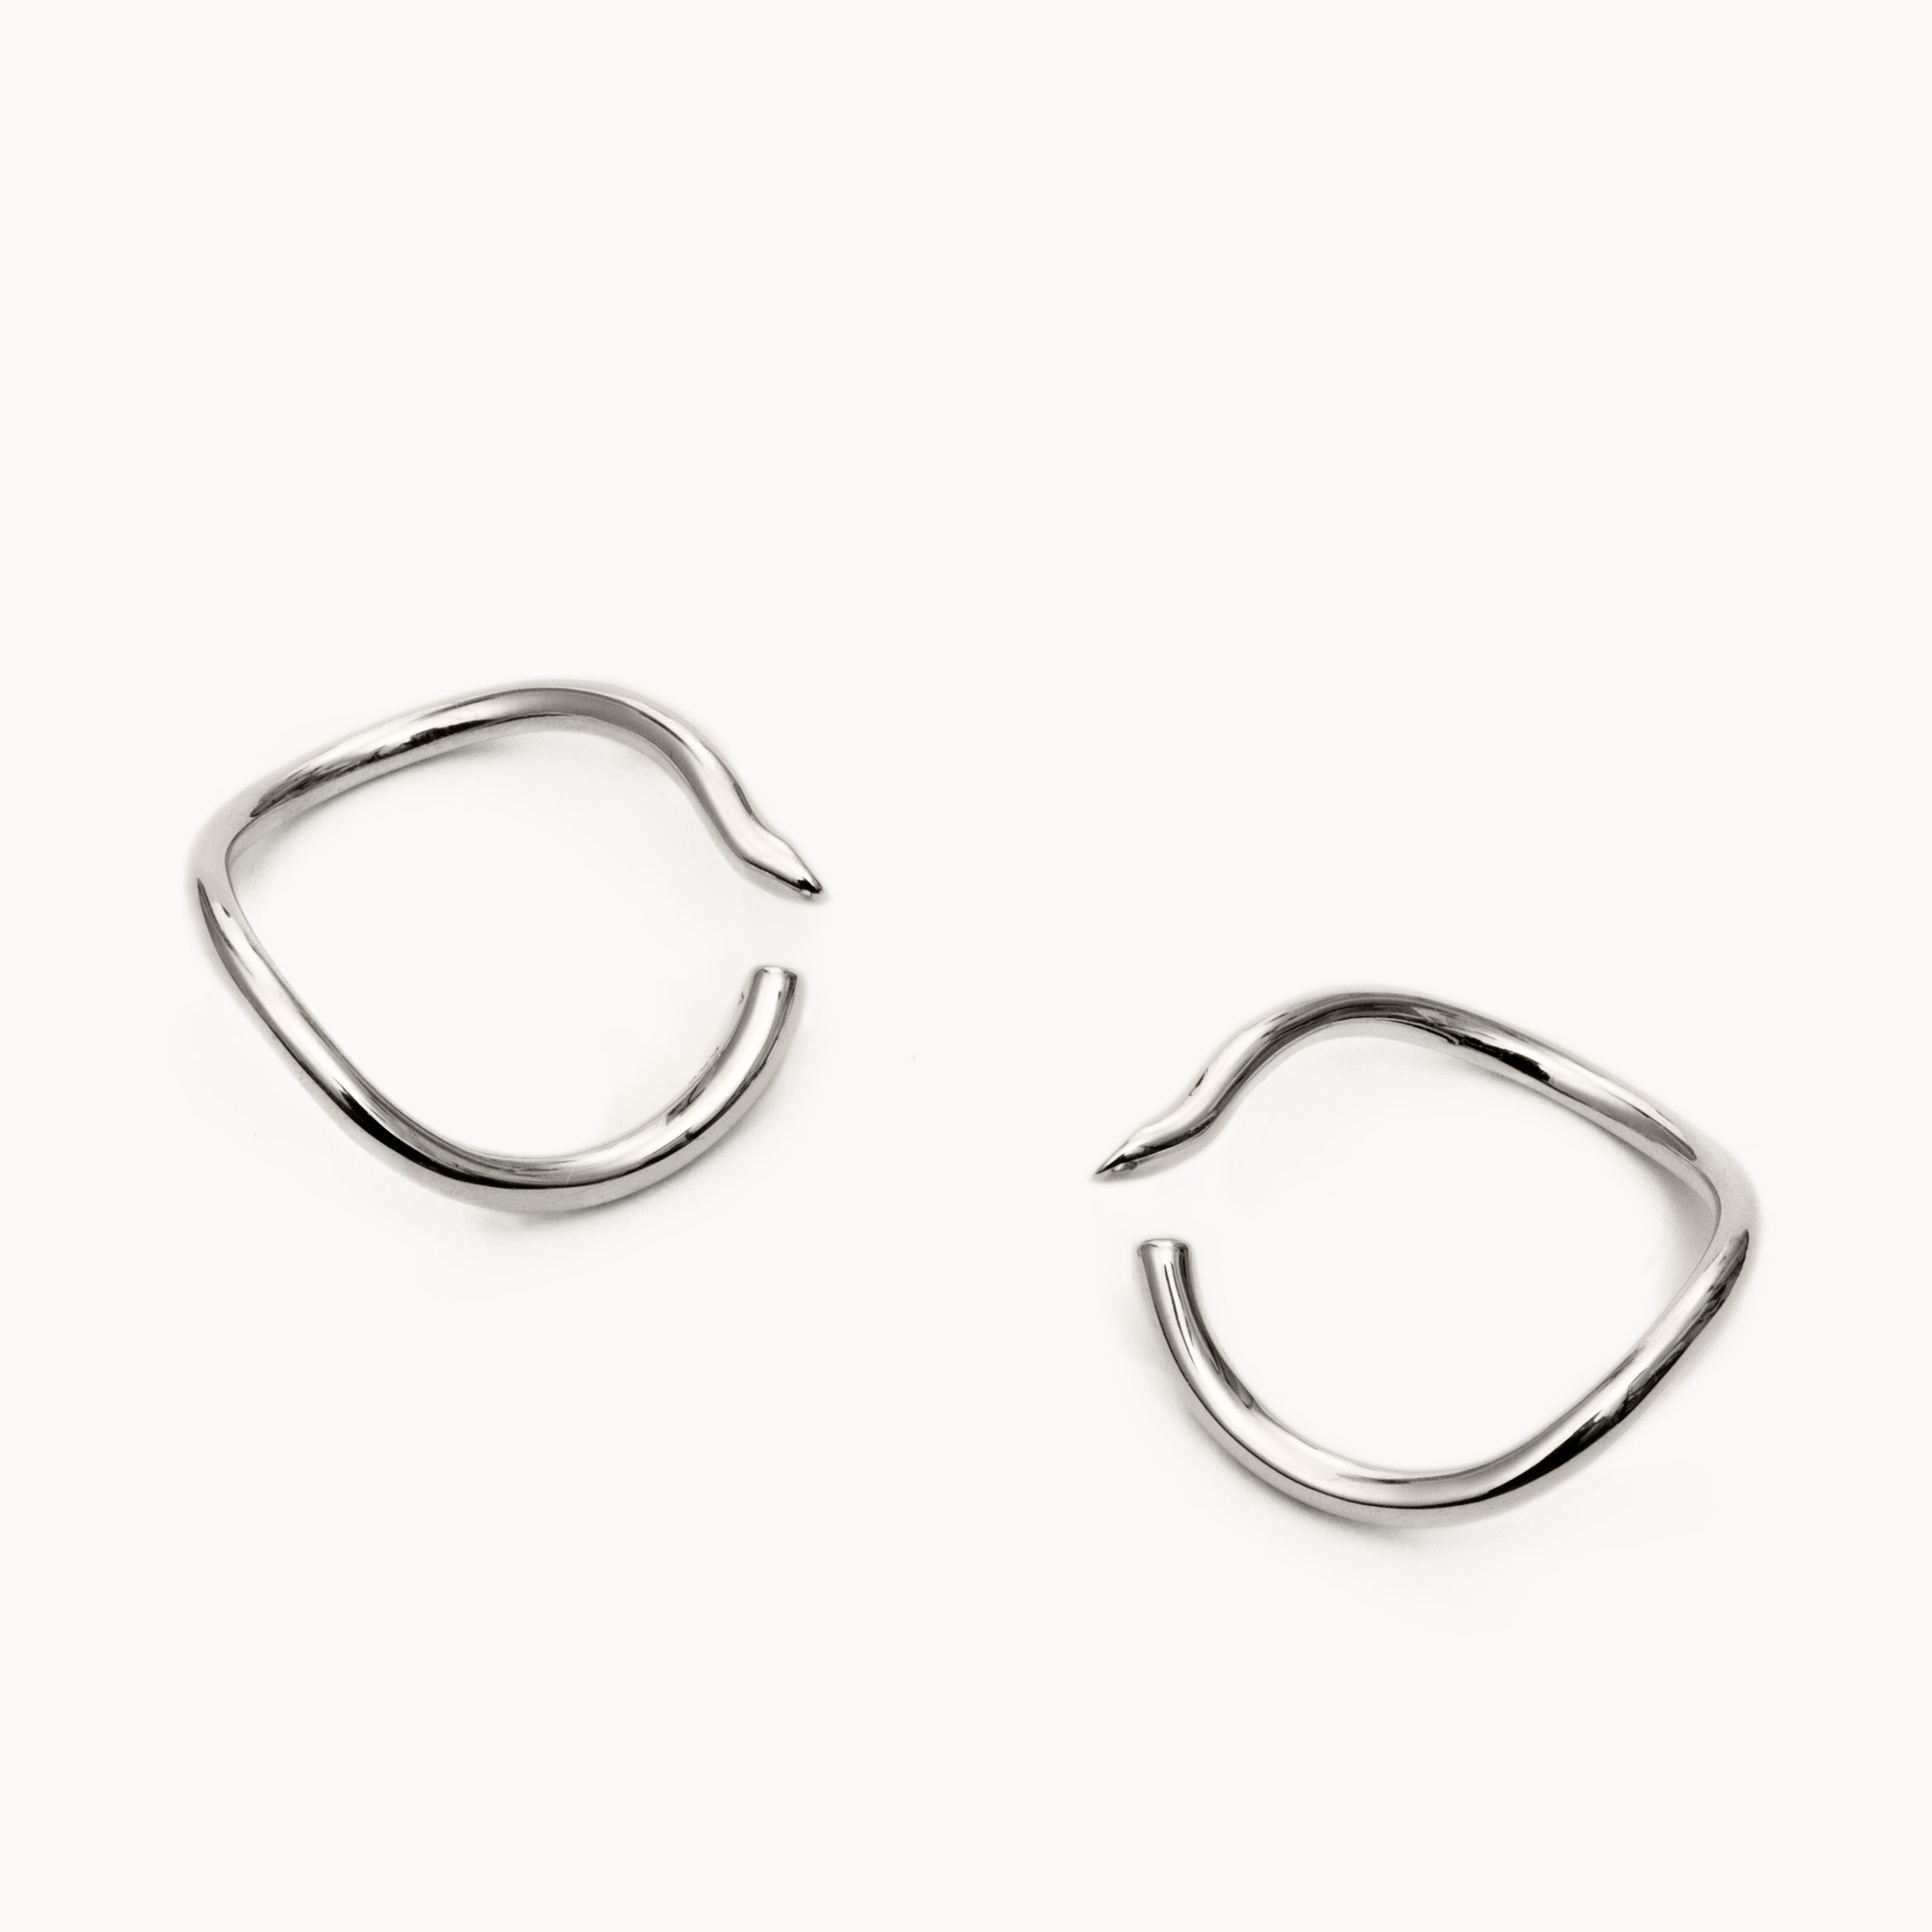 Ear Cuff|イヤーカフ  - art.1602C121010